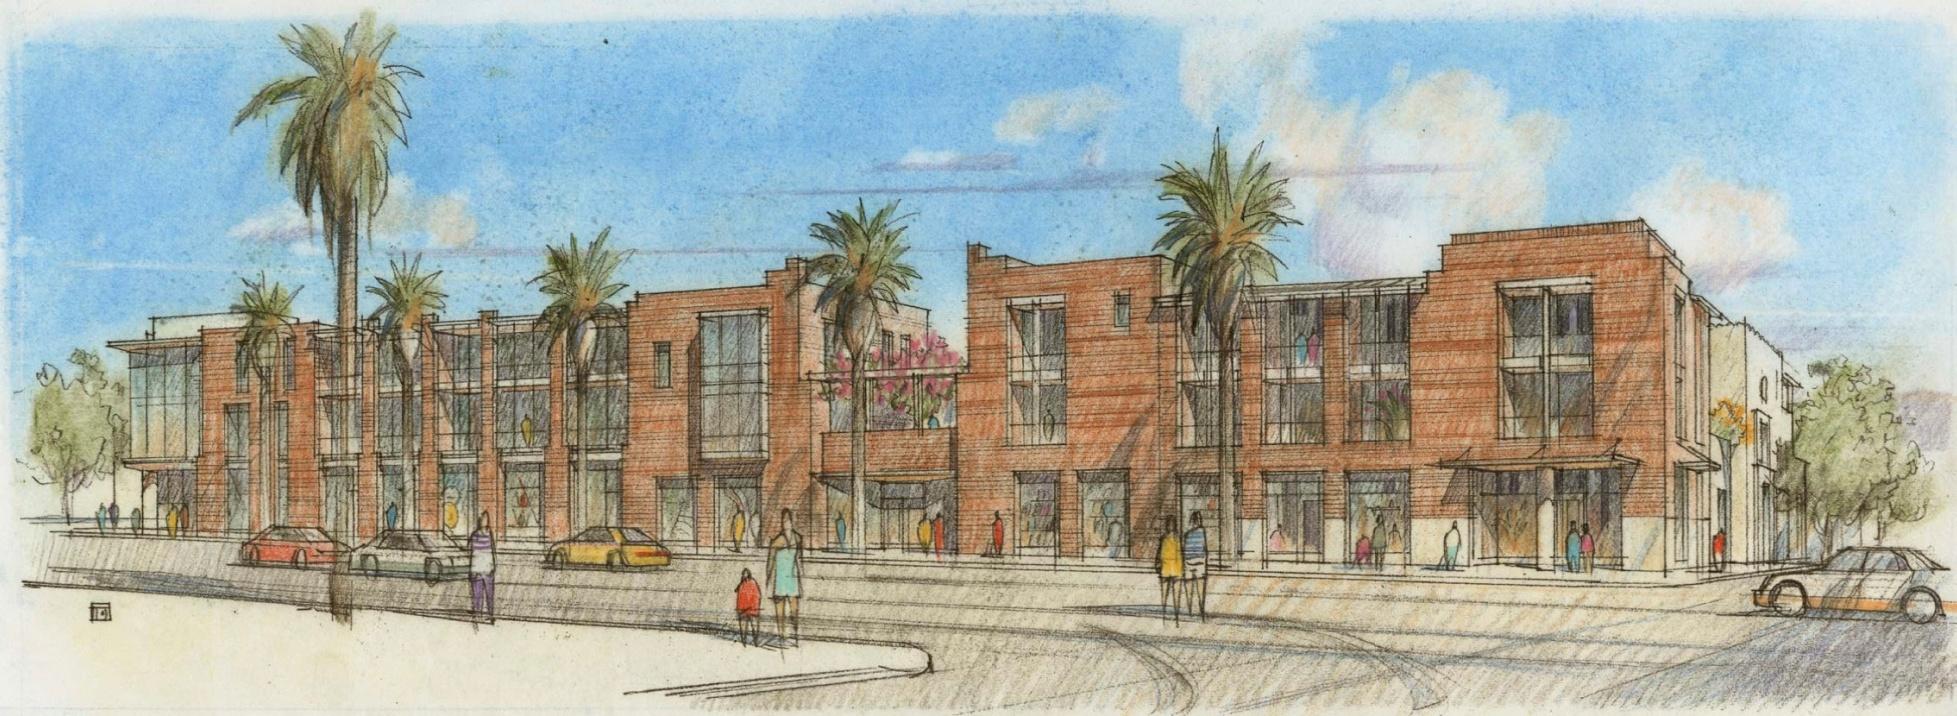 2300-Wilshire-Blvd city of santa monica